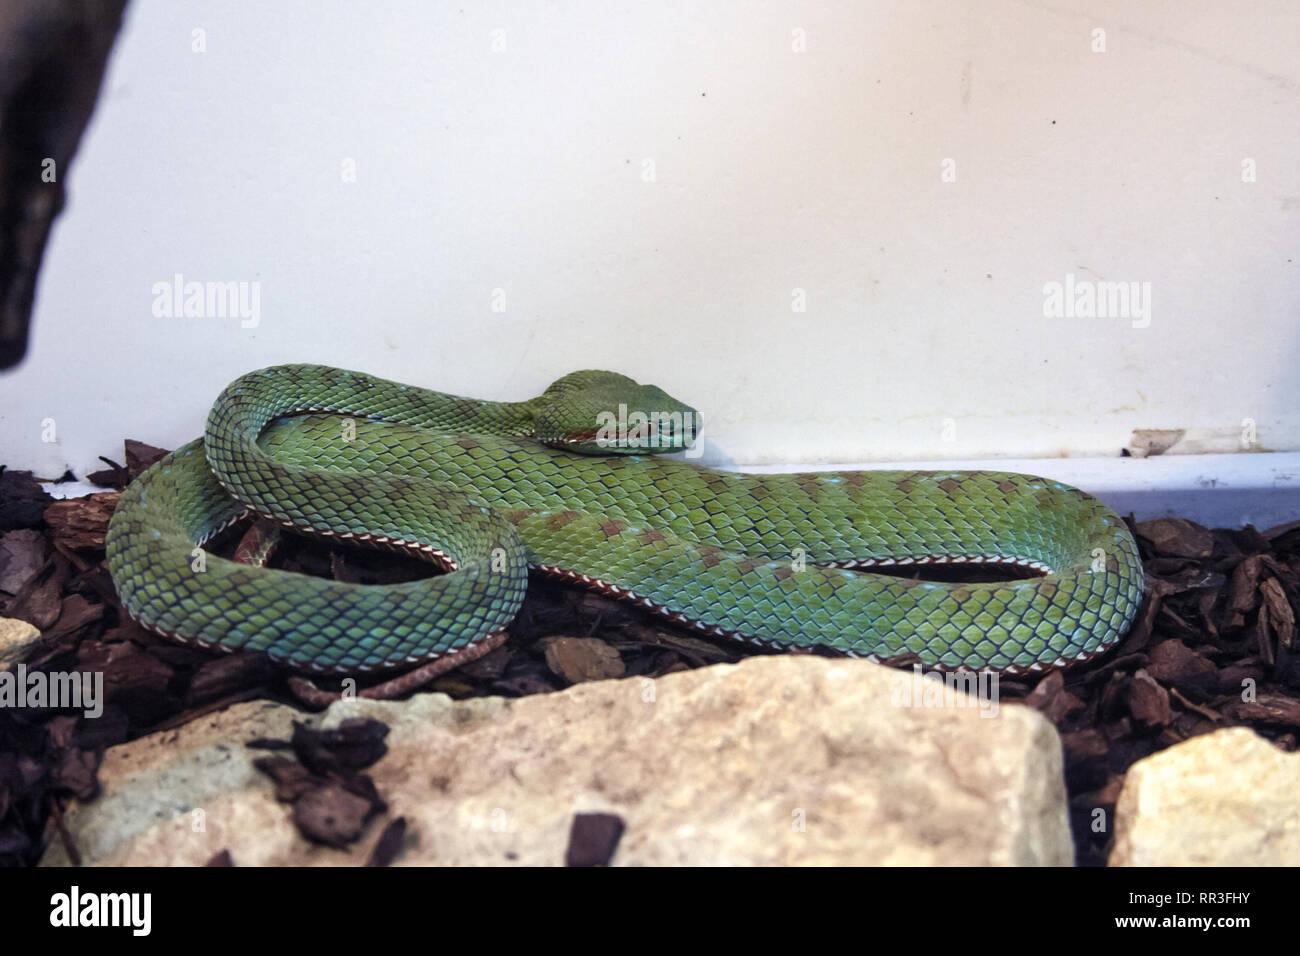 Vivarium Snake Stock Photos Vivarium Snake Stock Images Alamy